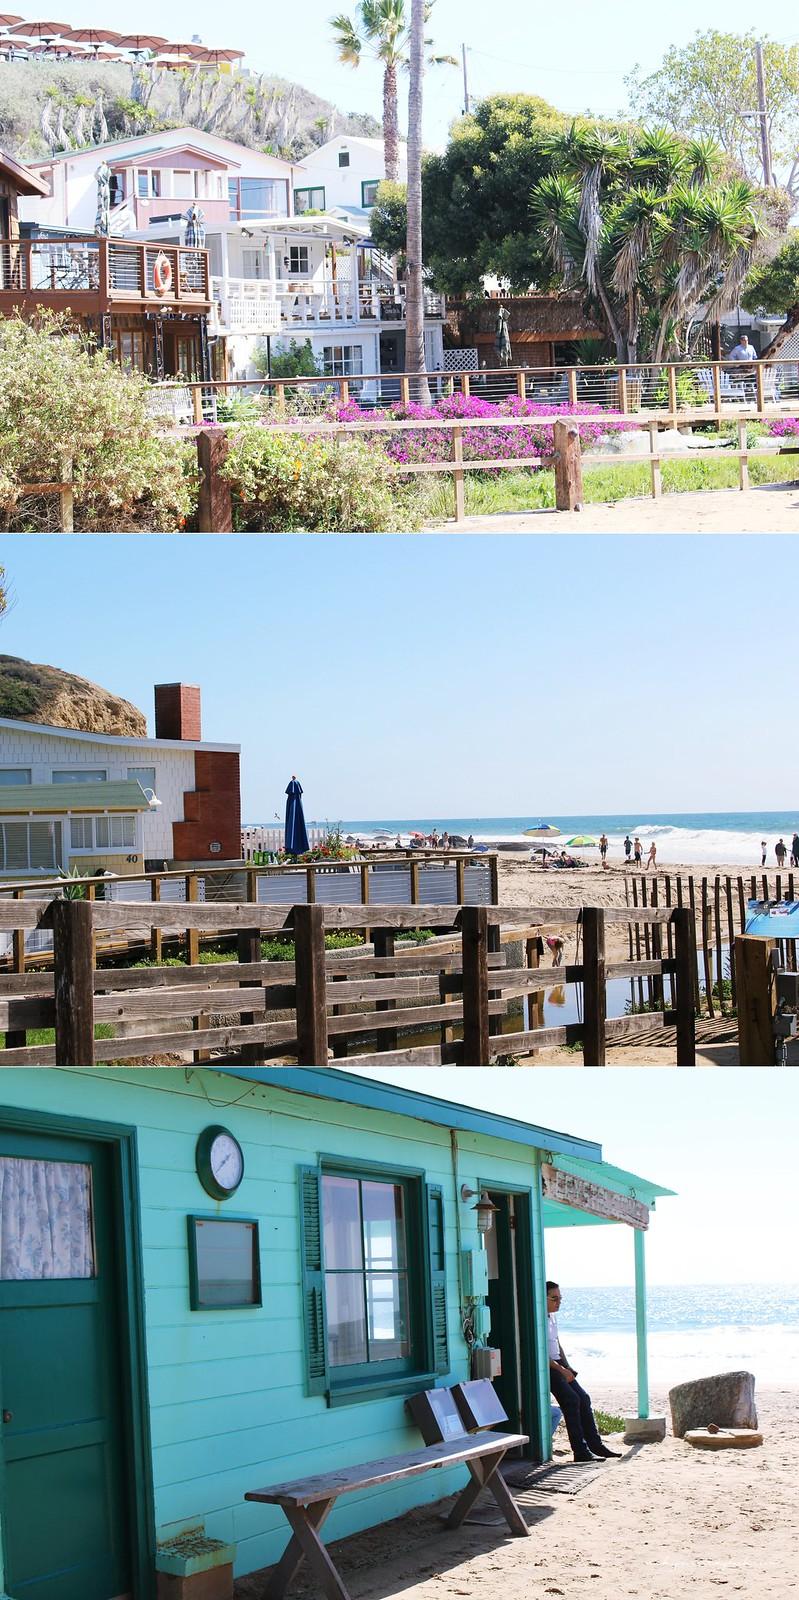 beachcomber2_vickyt